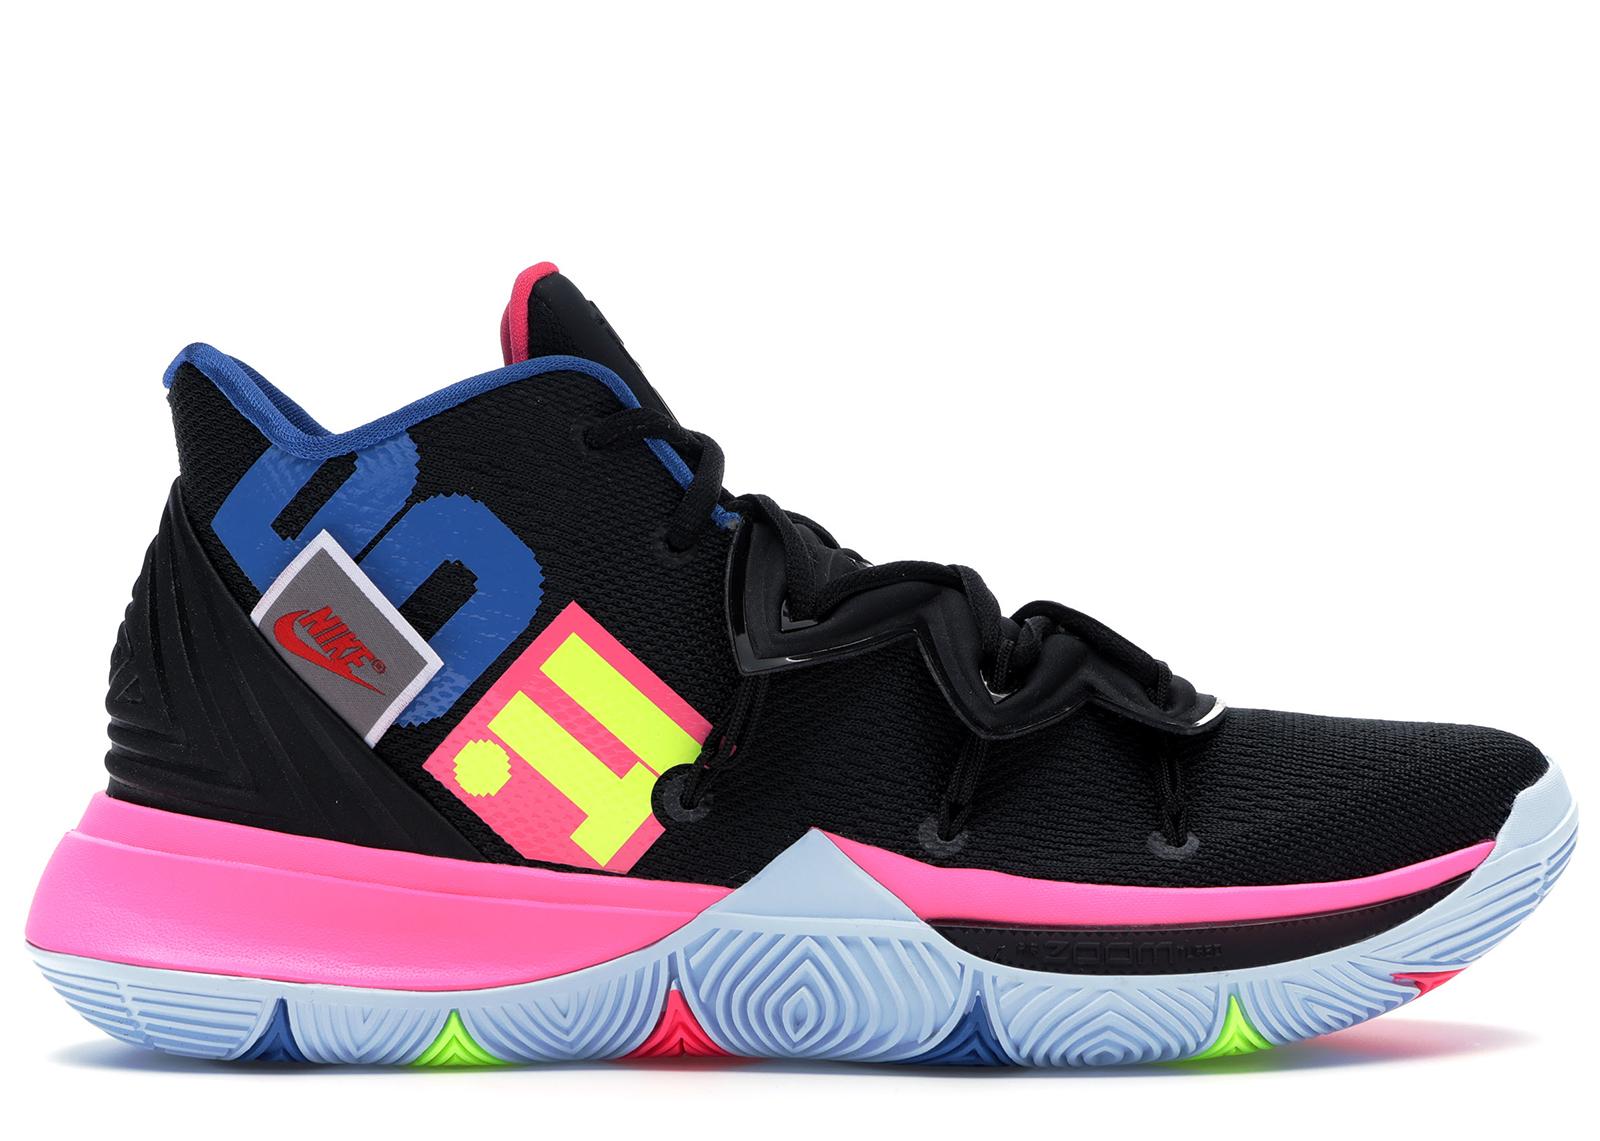 Nike Kyrie 5 Just Do It - AO2918-003